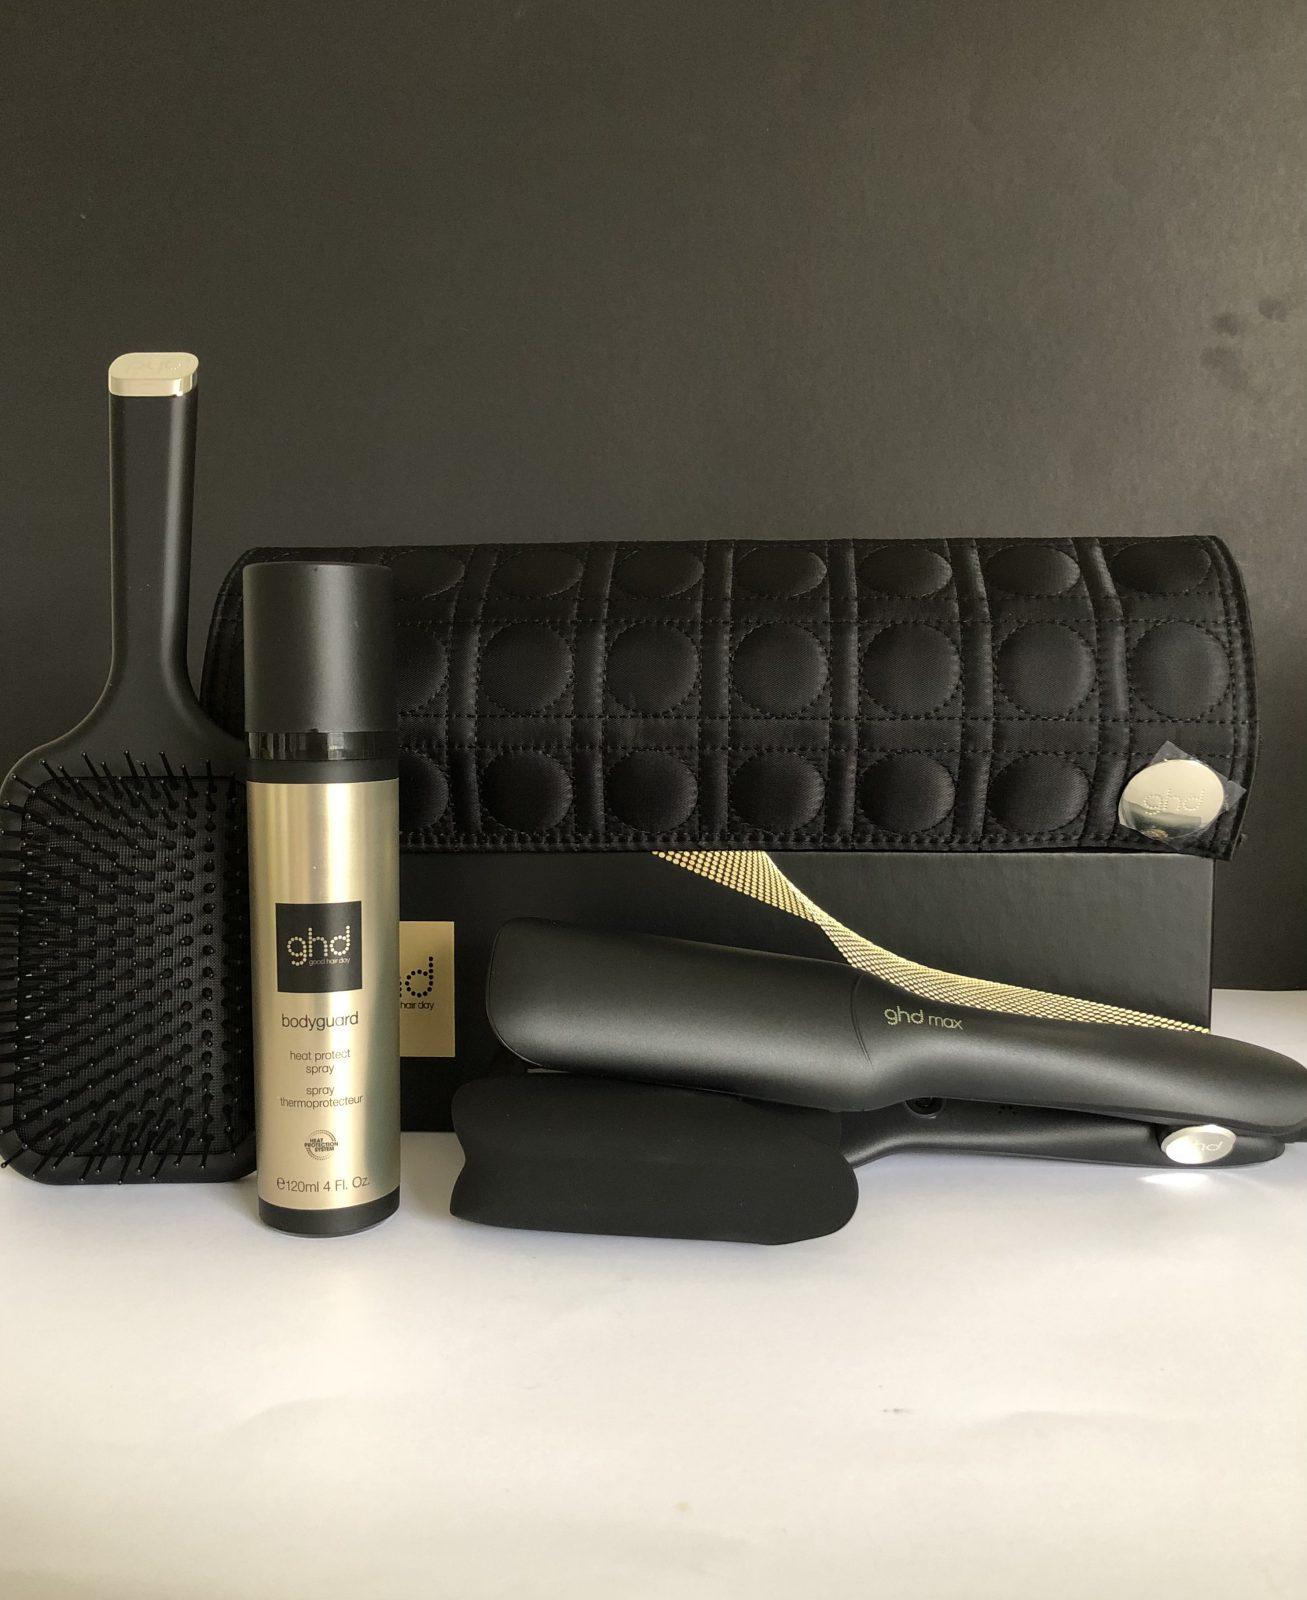 Kit GHD Max